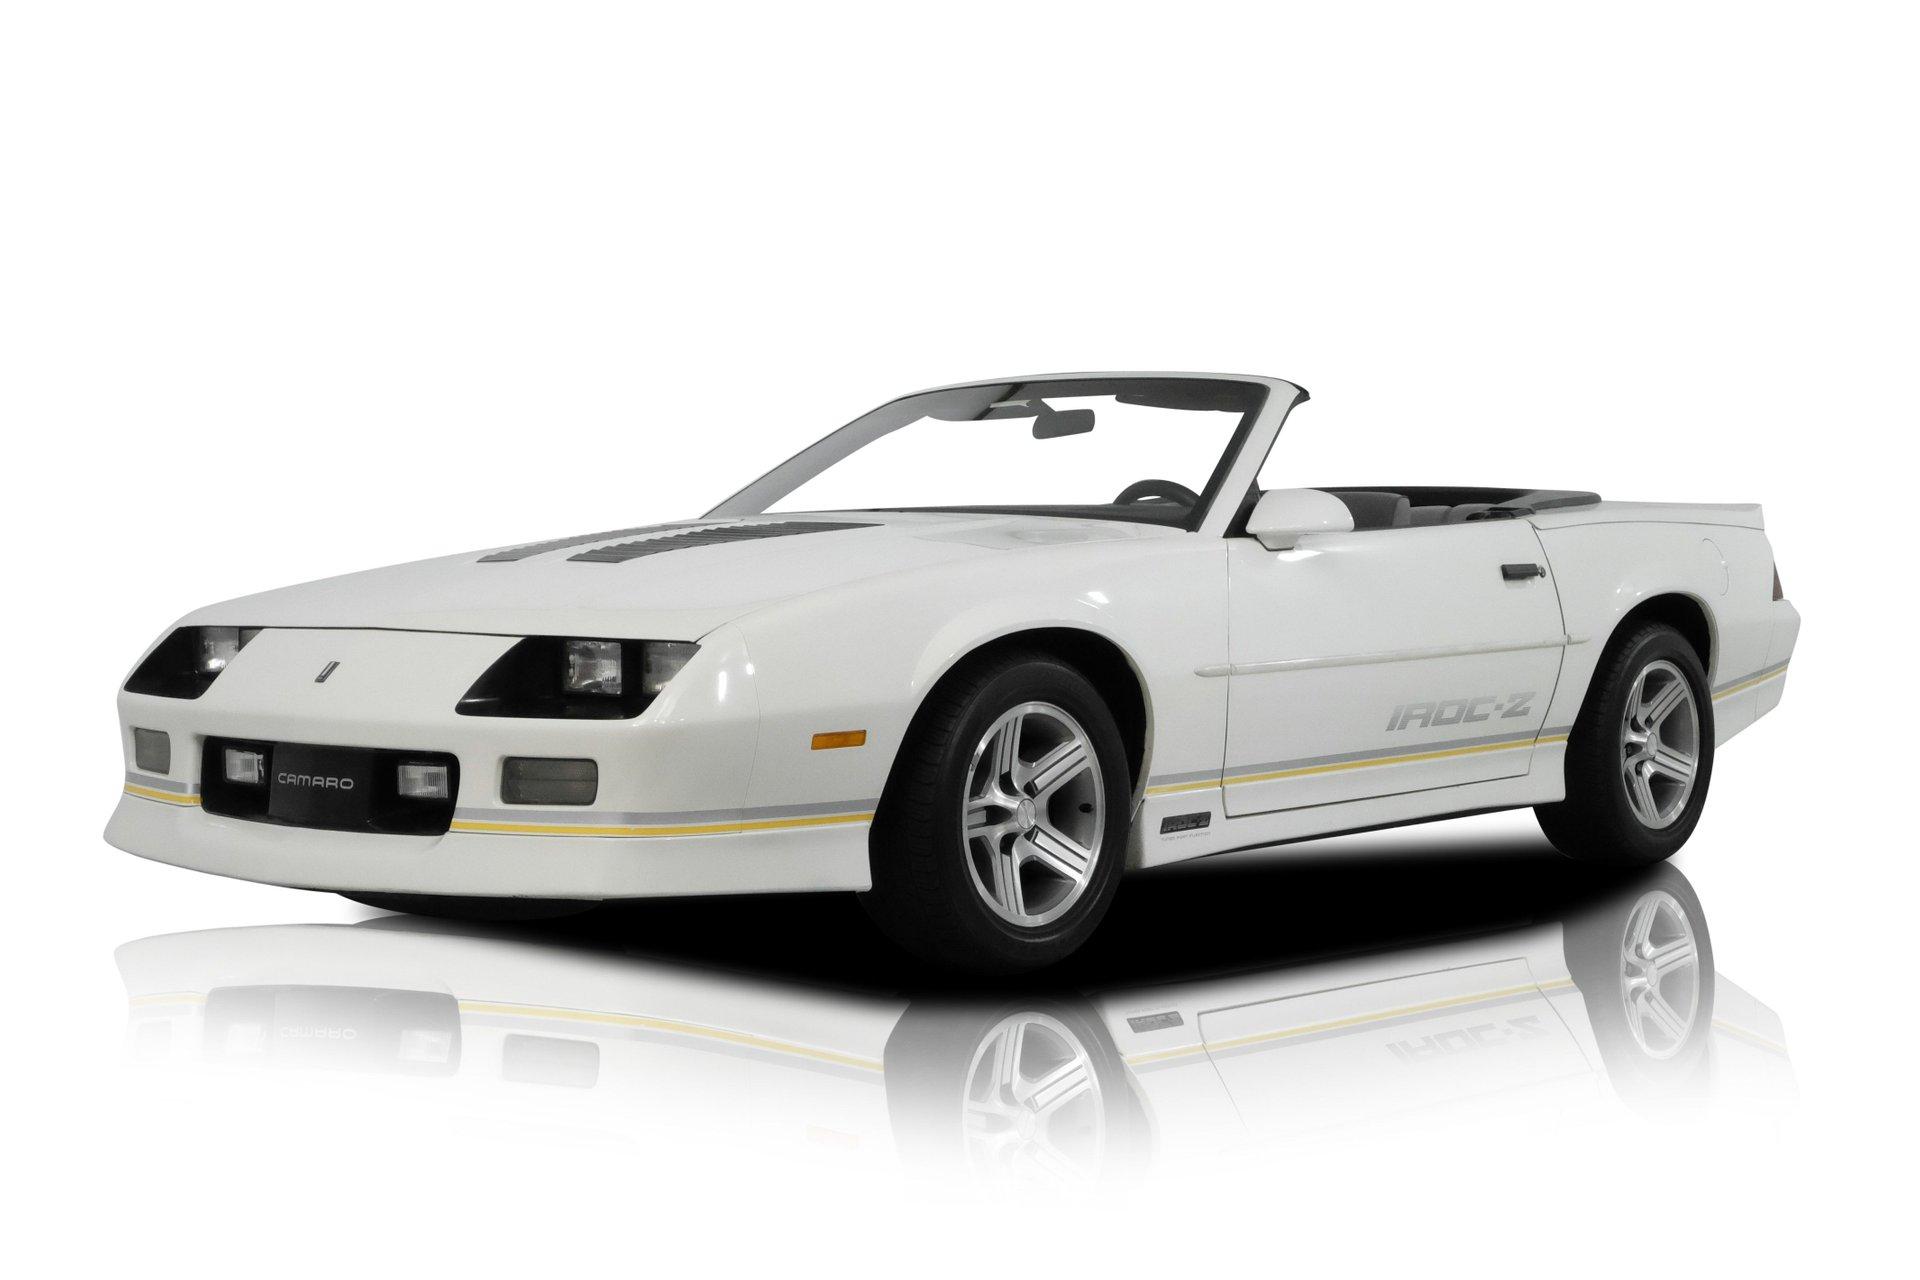 1988 chevrolet camaro iroc z28 convertible